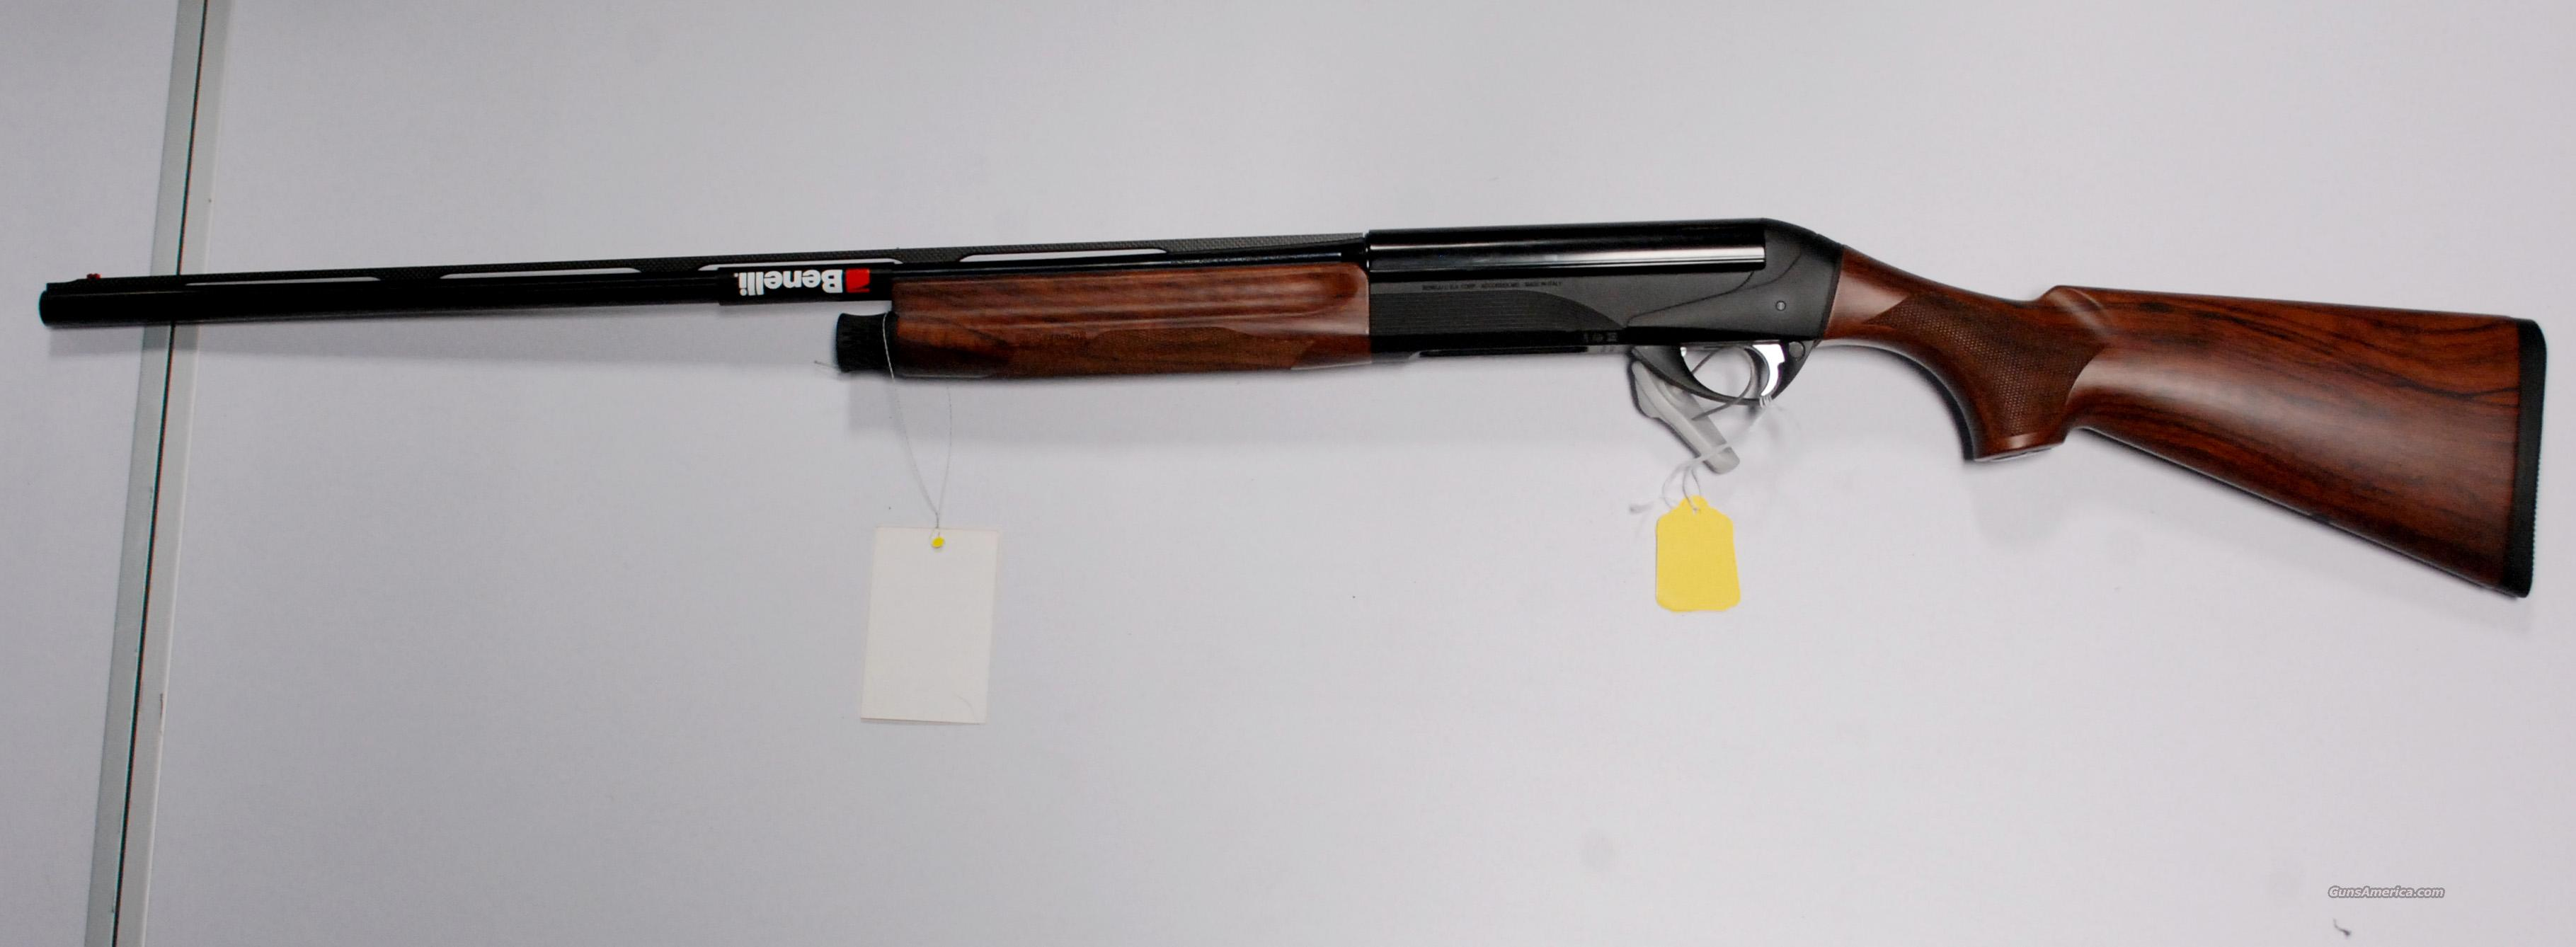 Benelli Ultra Light Shotgun Wallpapers, Weapons, HQ